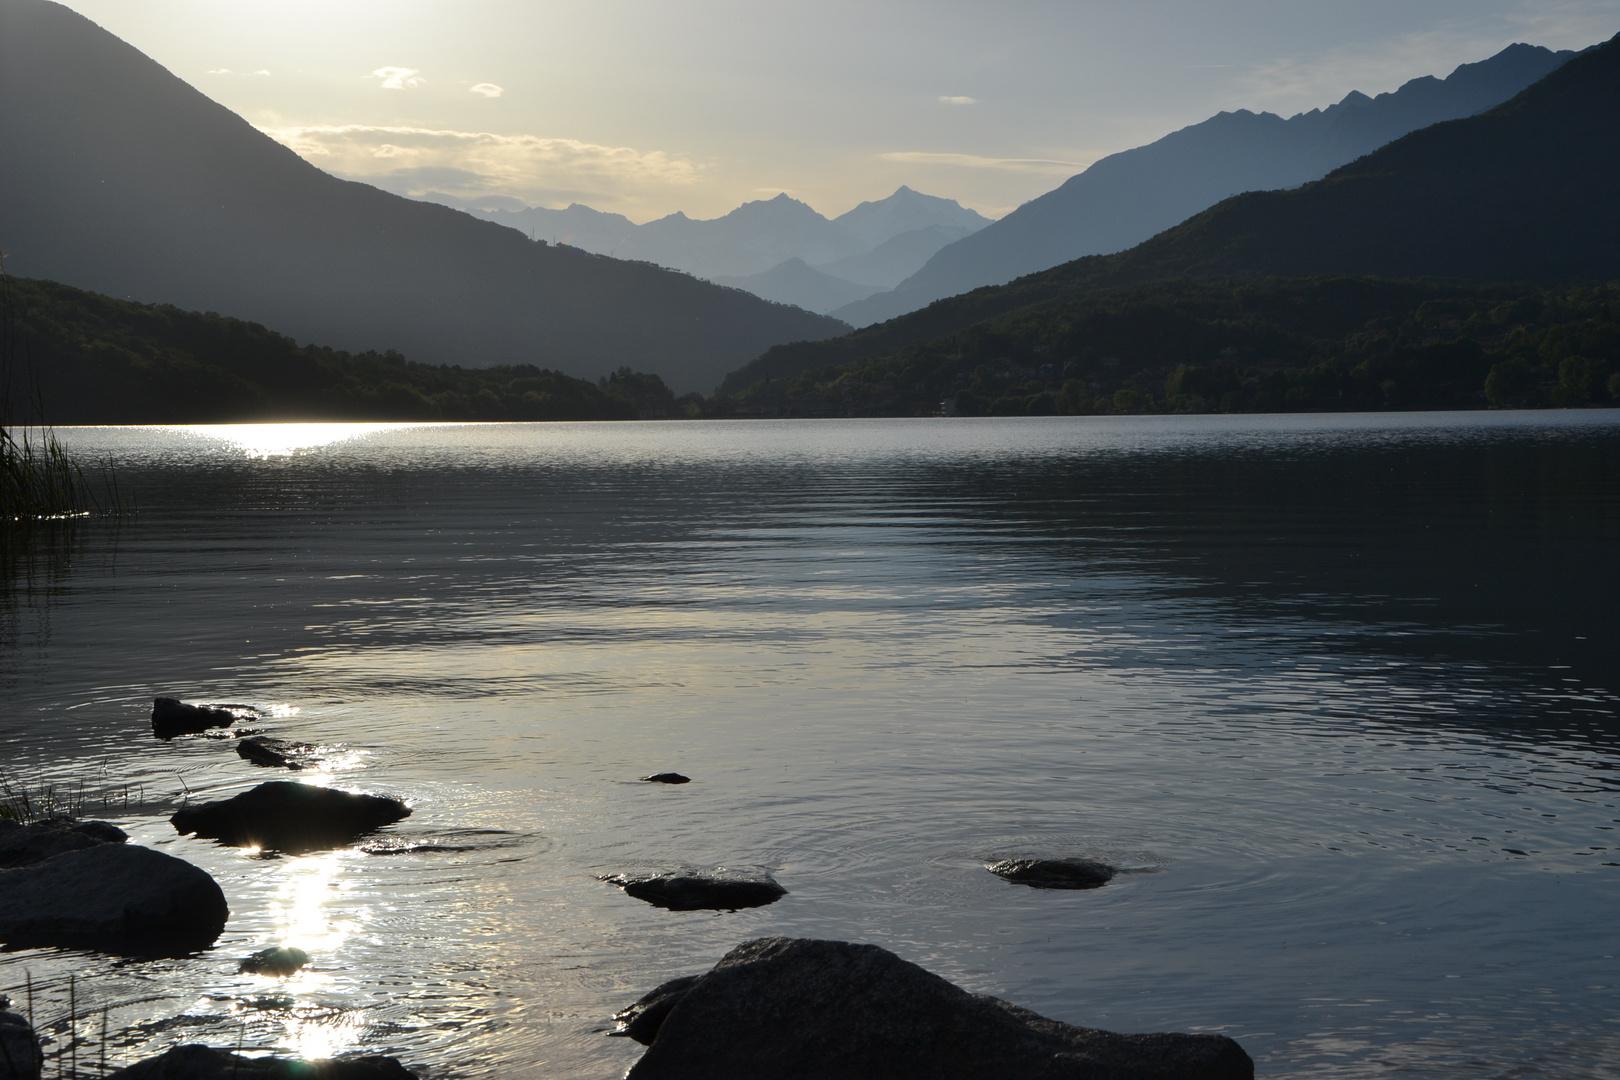 Lago Mergozzo im Sonnenuntergang